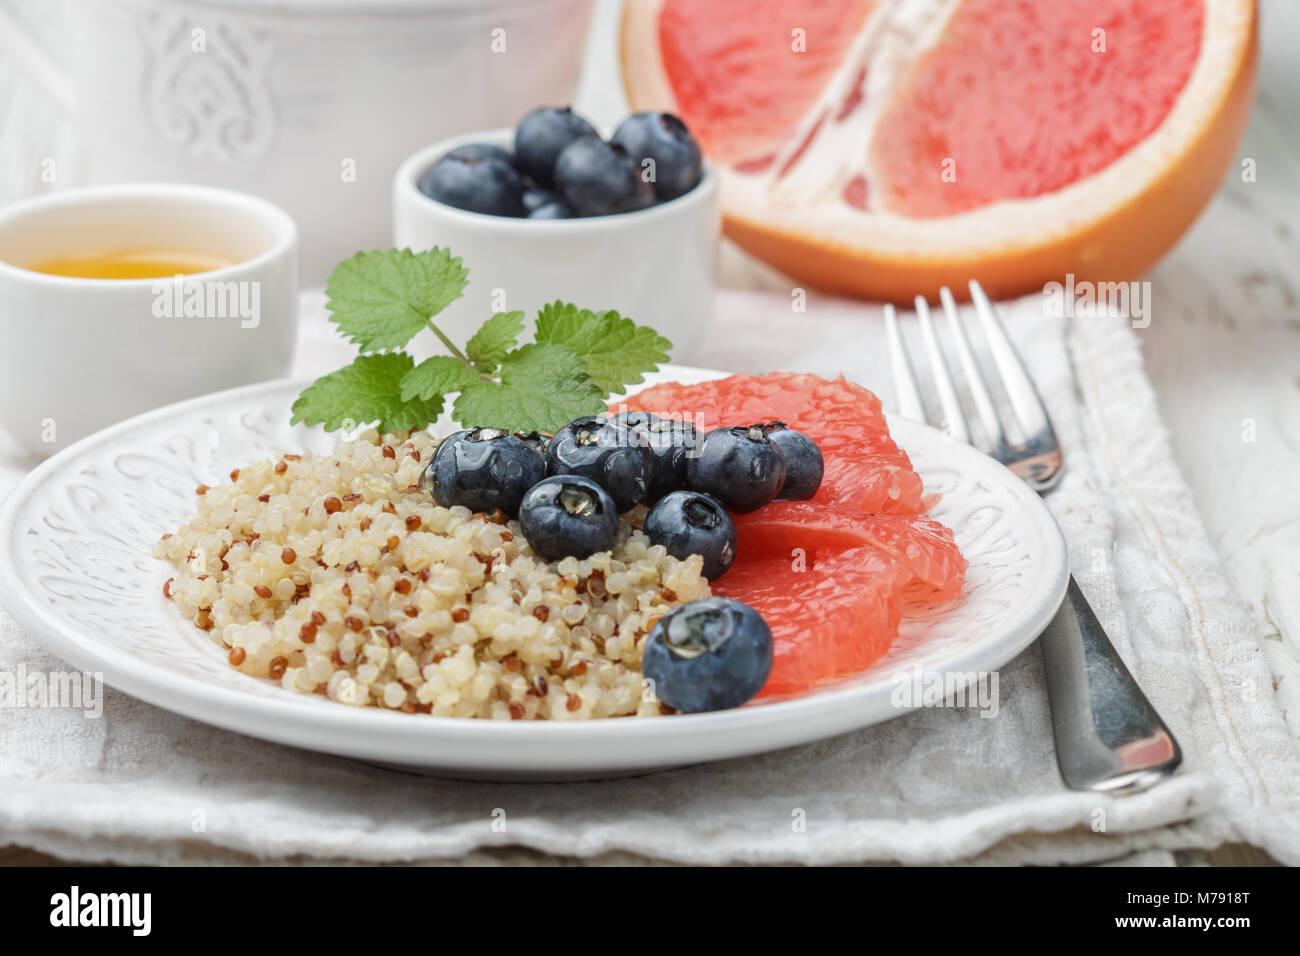 Quinoa porridge with grapefruit, fresh berries blueberry and honey. Healthy and tasty Breakfast. Selective focus - Stock Image